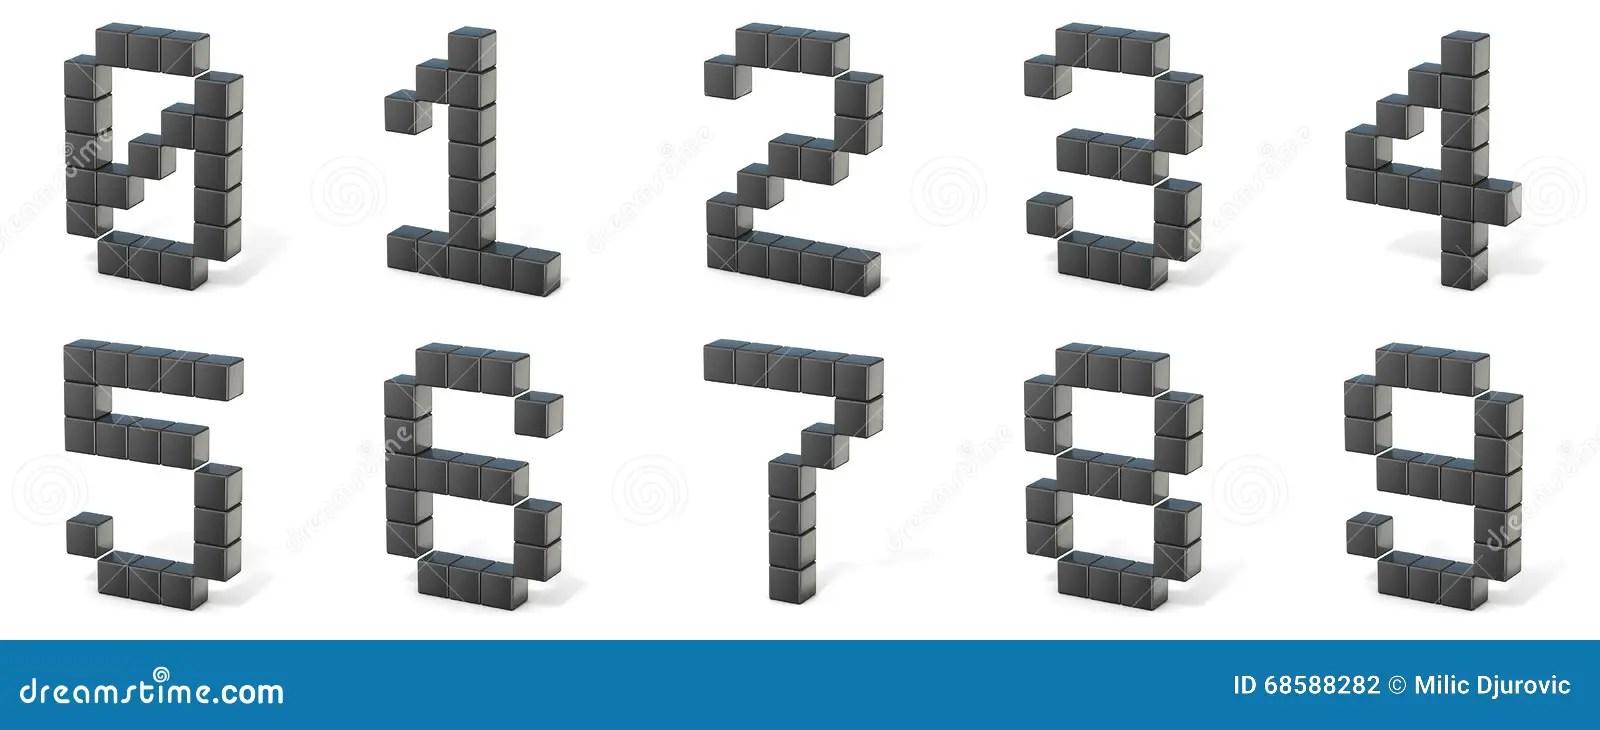 8 bit font. Numbers. 3D stock illustration. Illustration